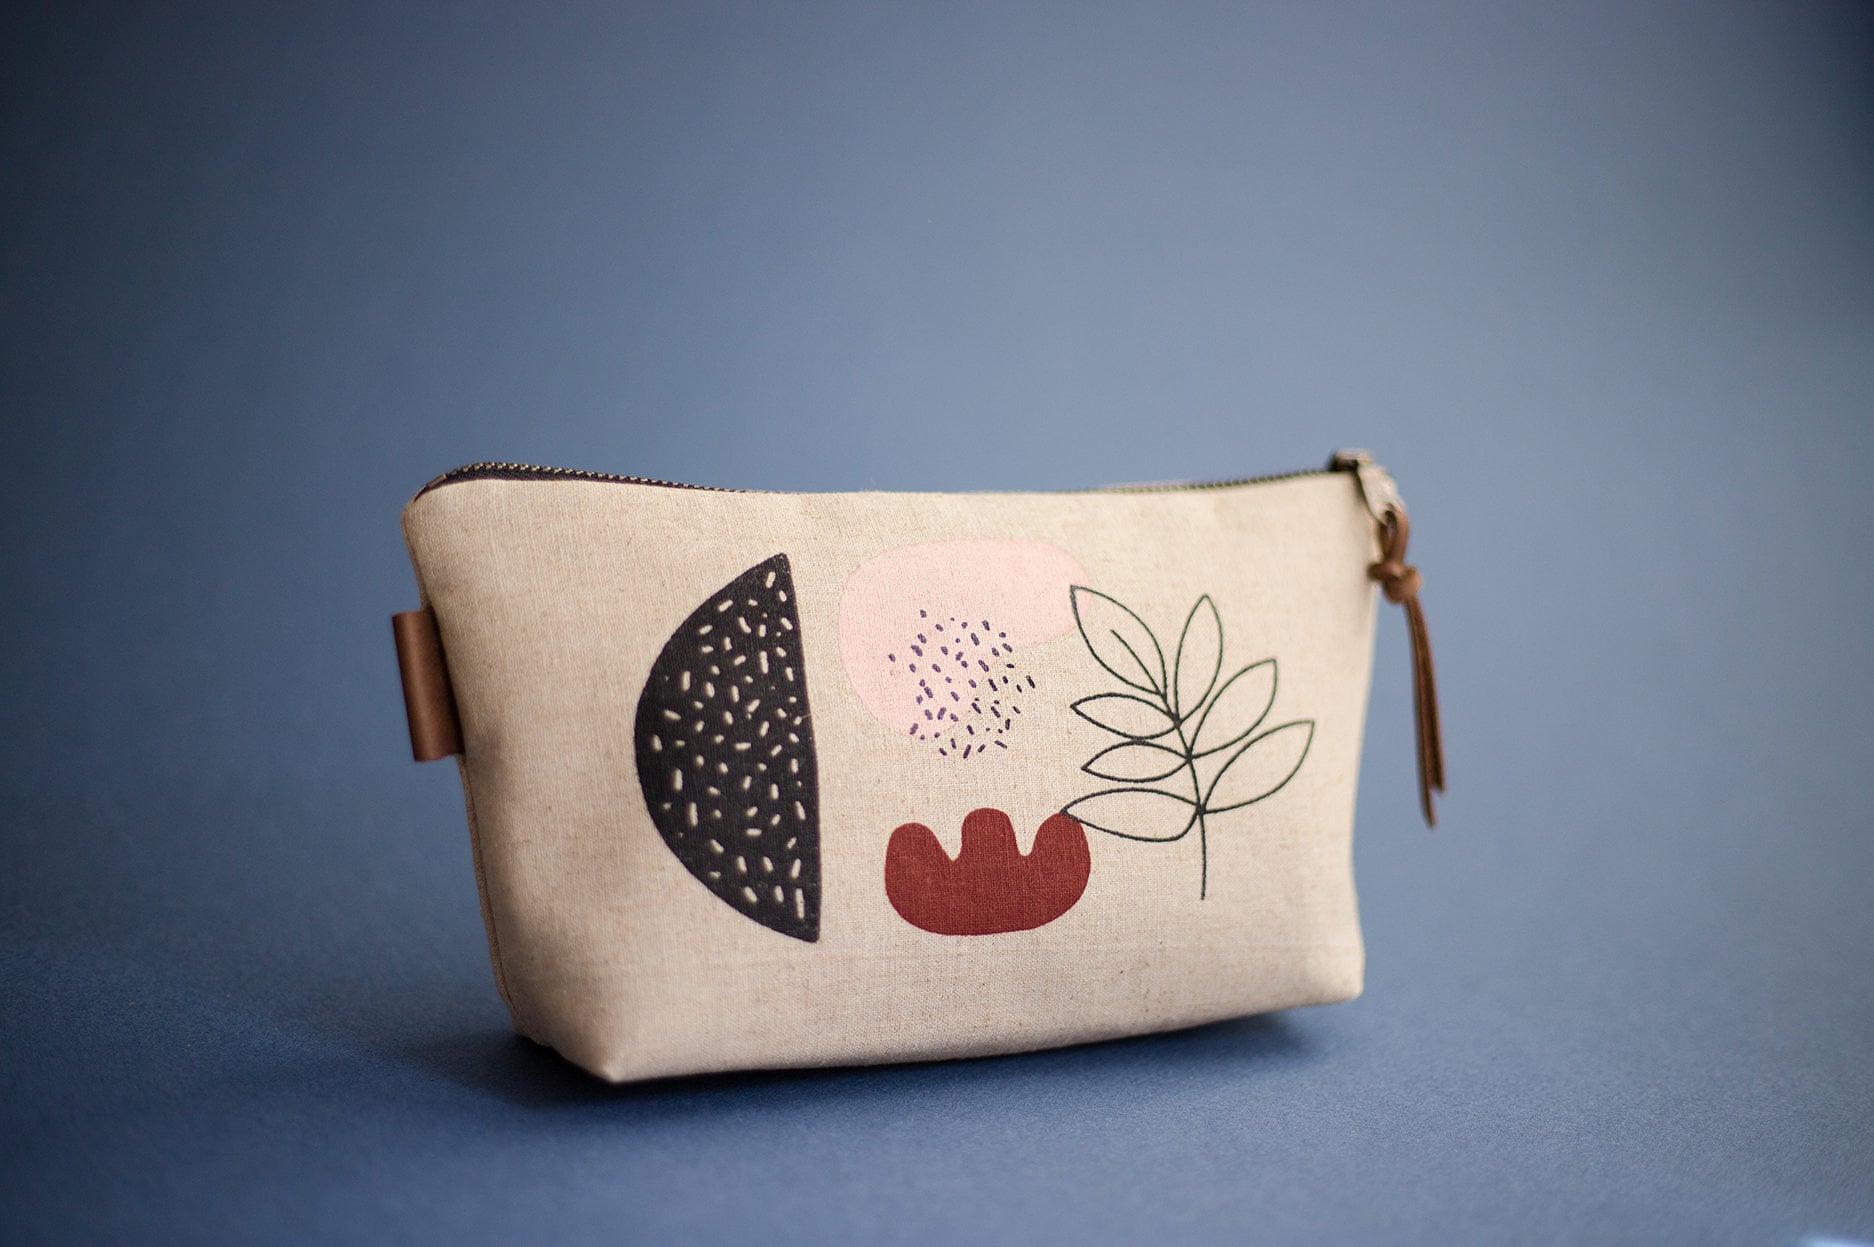 c07bbd0b02c8 Abstract Print Purse, Small Makeup Bag, Screen Printed Purse, Linen ...